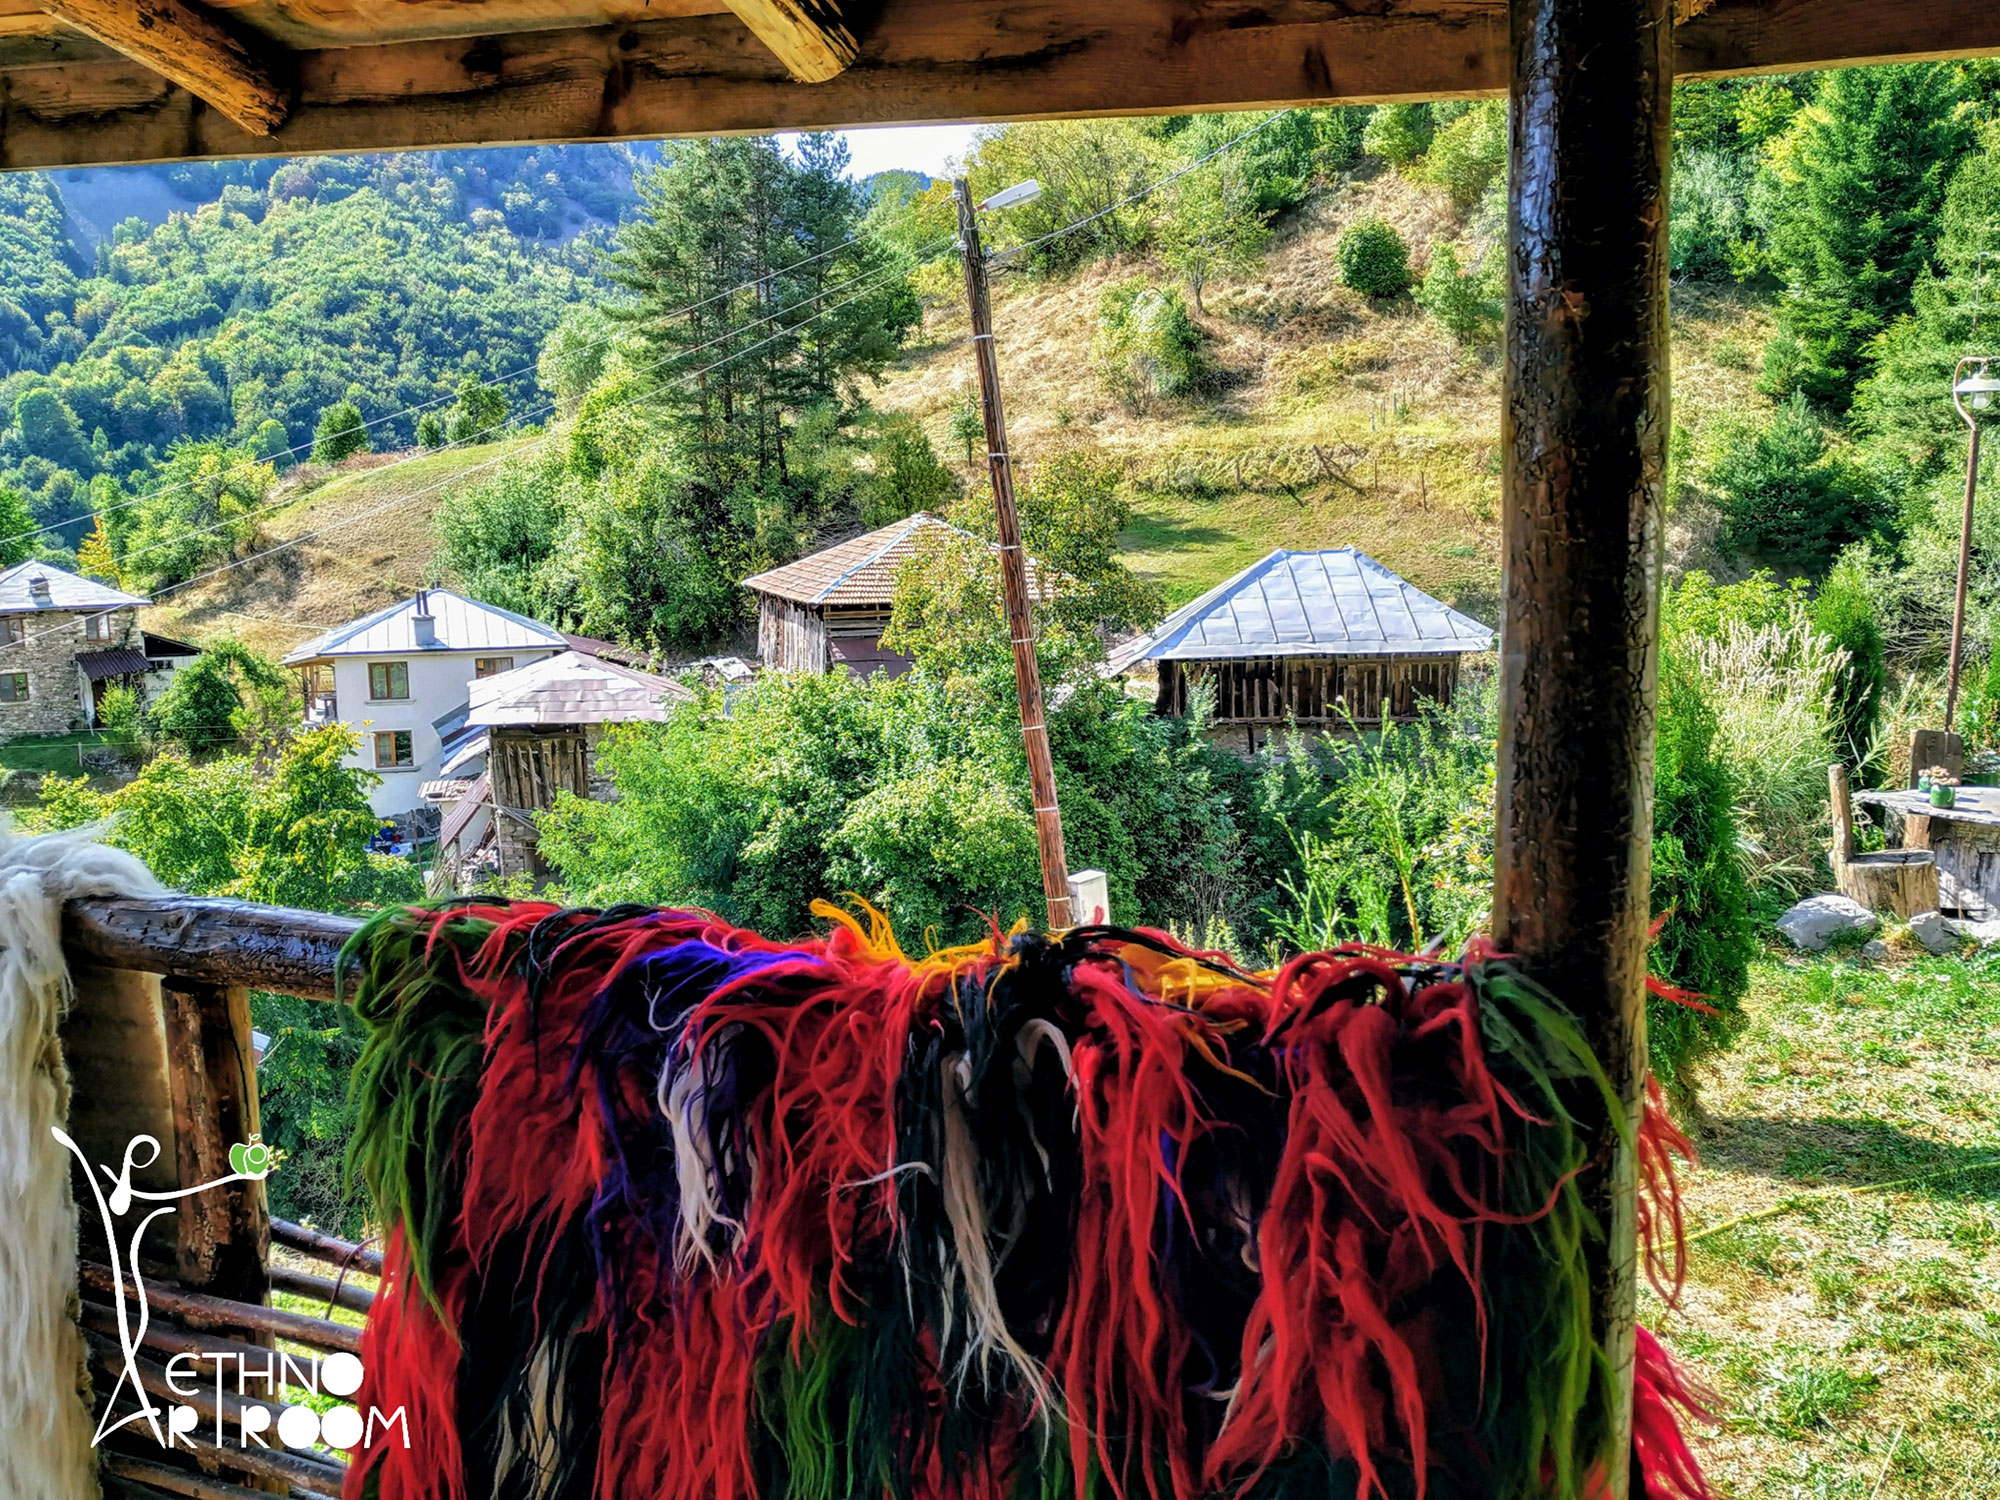 ethno art room mountain Bulgaria